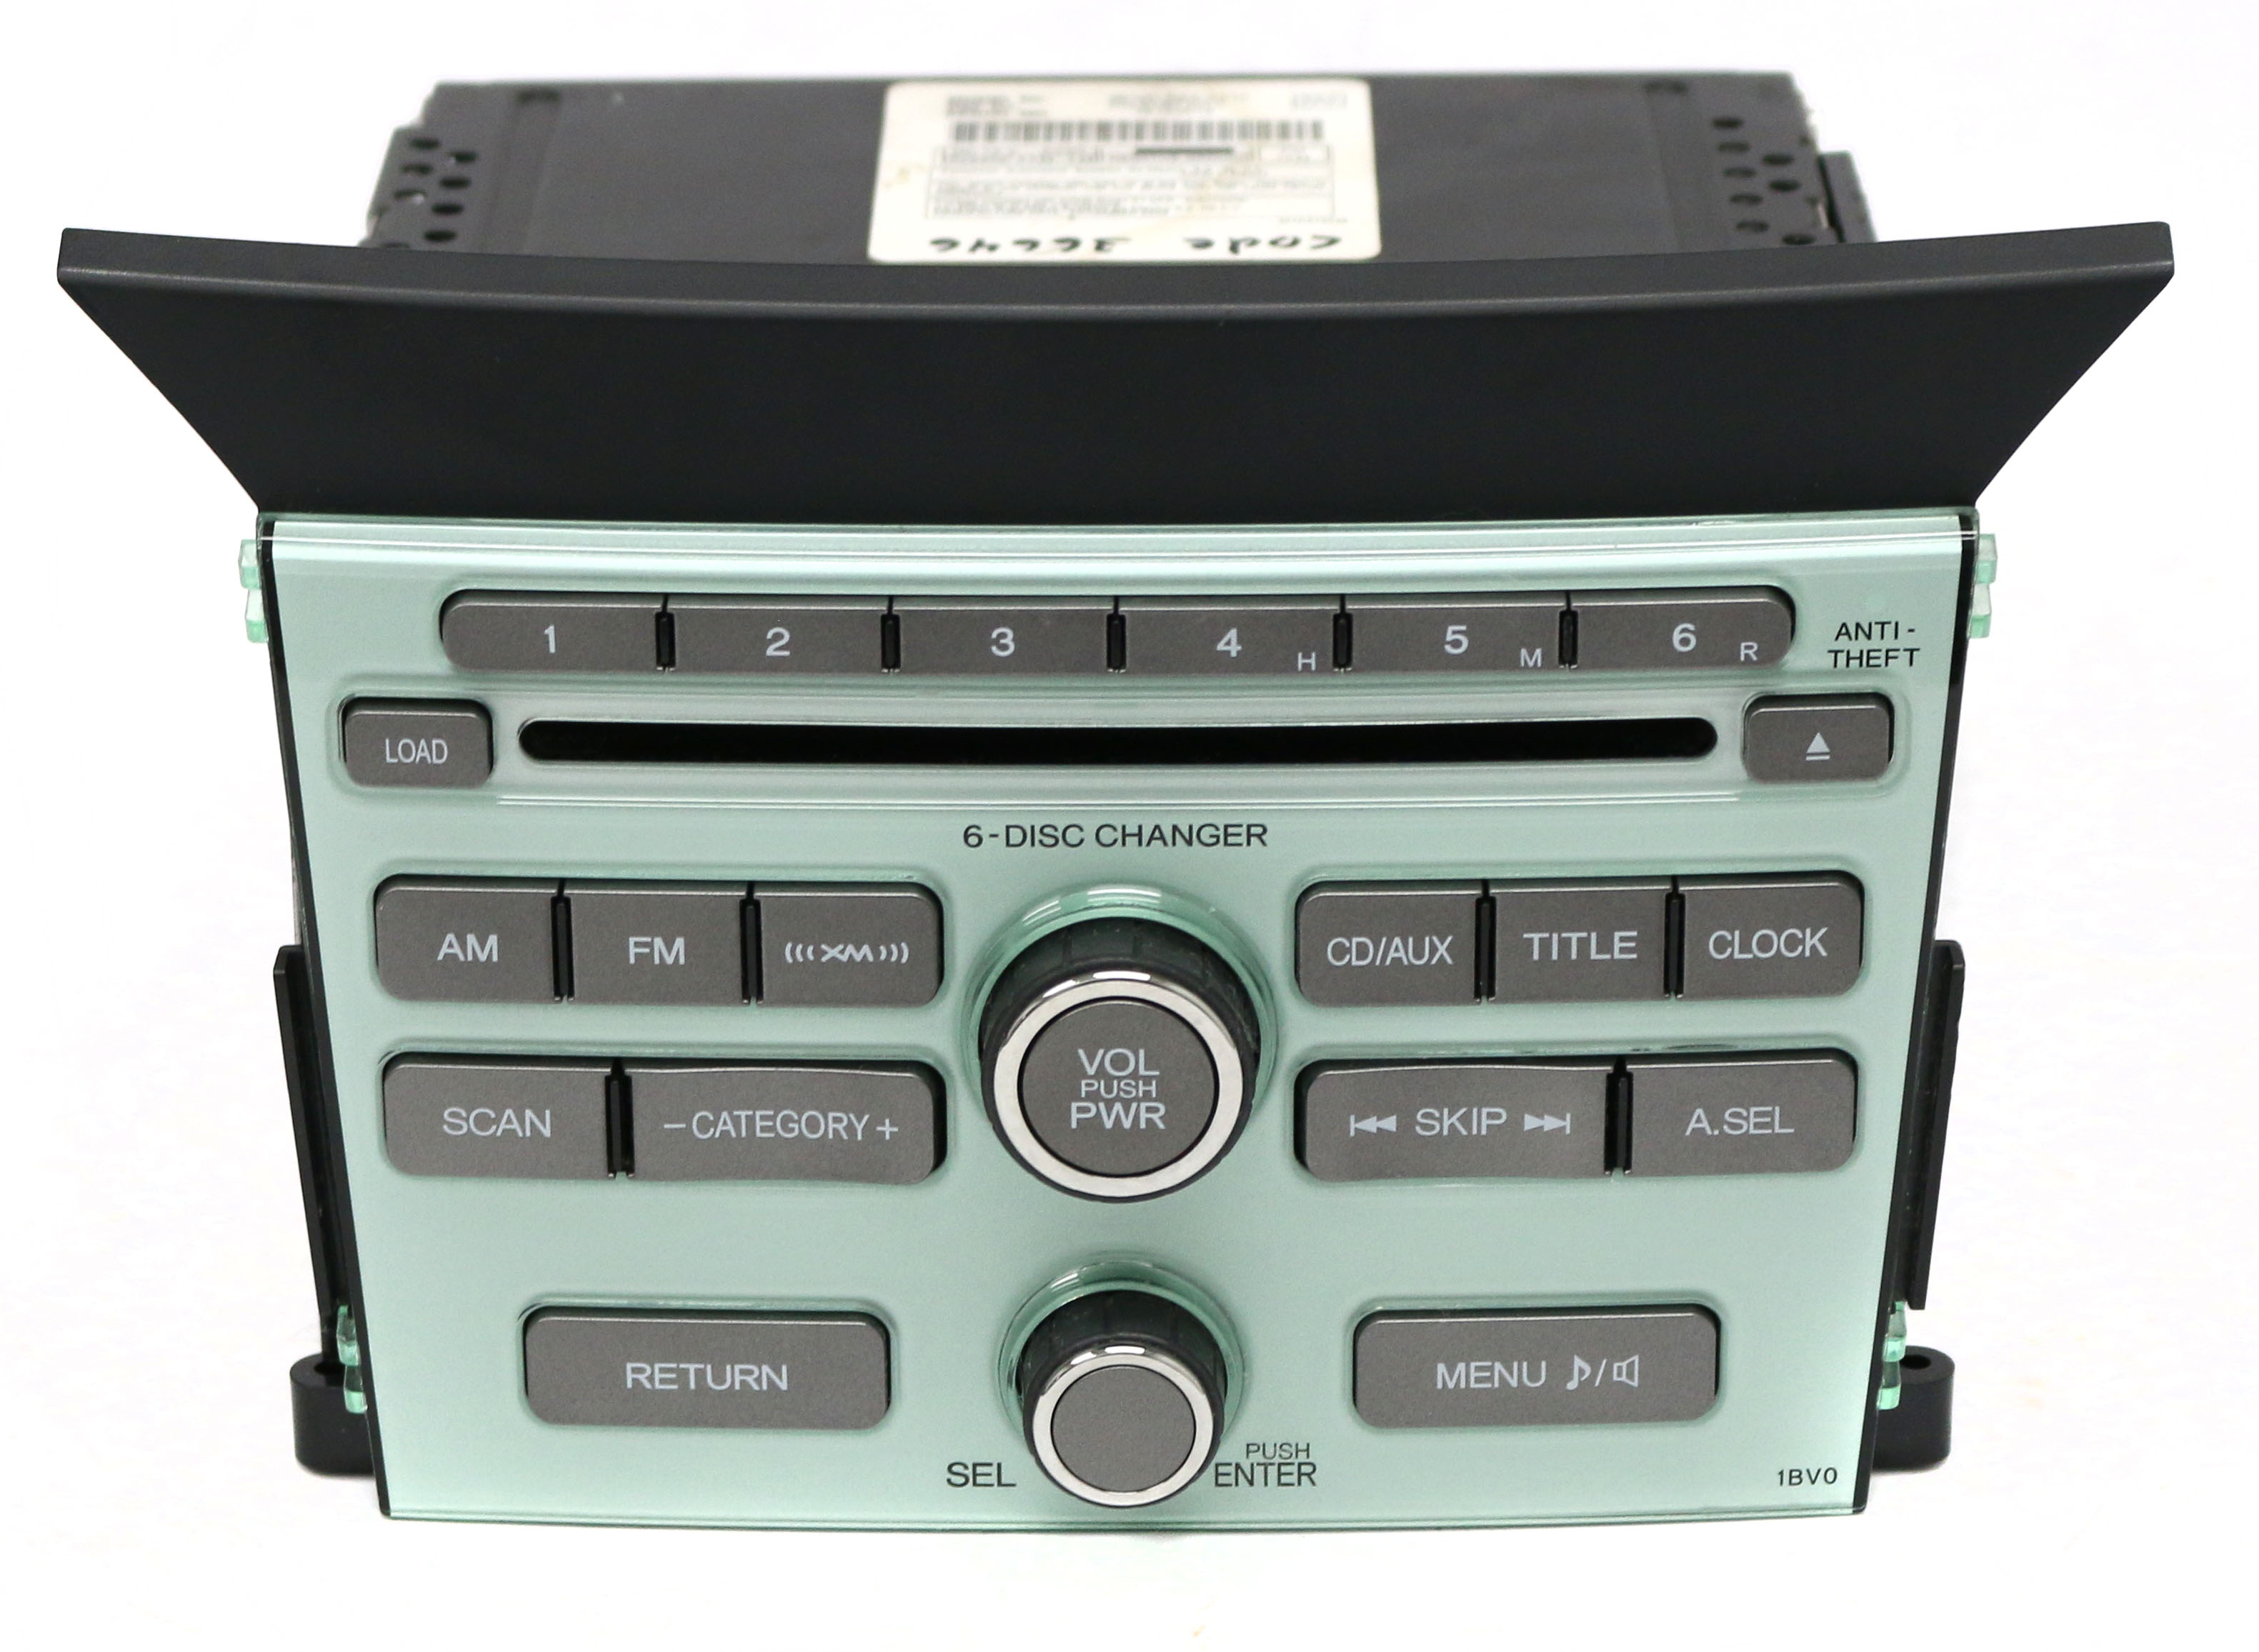 2009 2011 Honda Pilot Am Fm Satellite Radio Mp3 6 Disc Cd 39100 Sza A210 1bv0 Refurbished Walmart Com Walmart Com